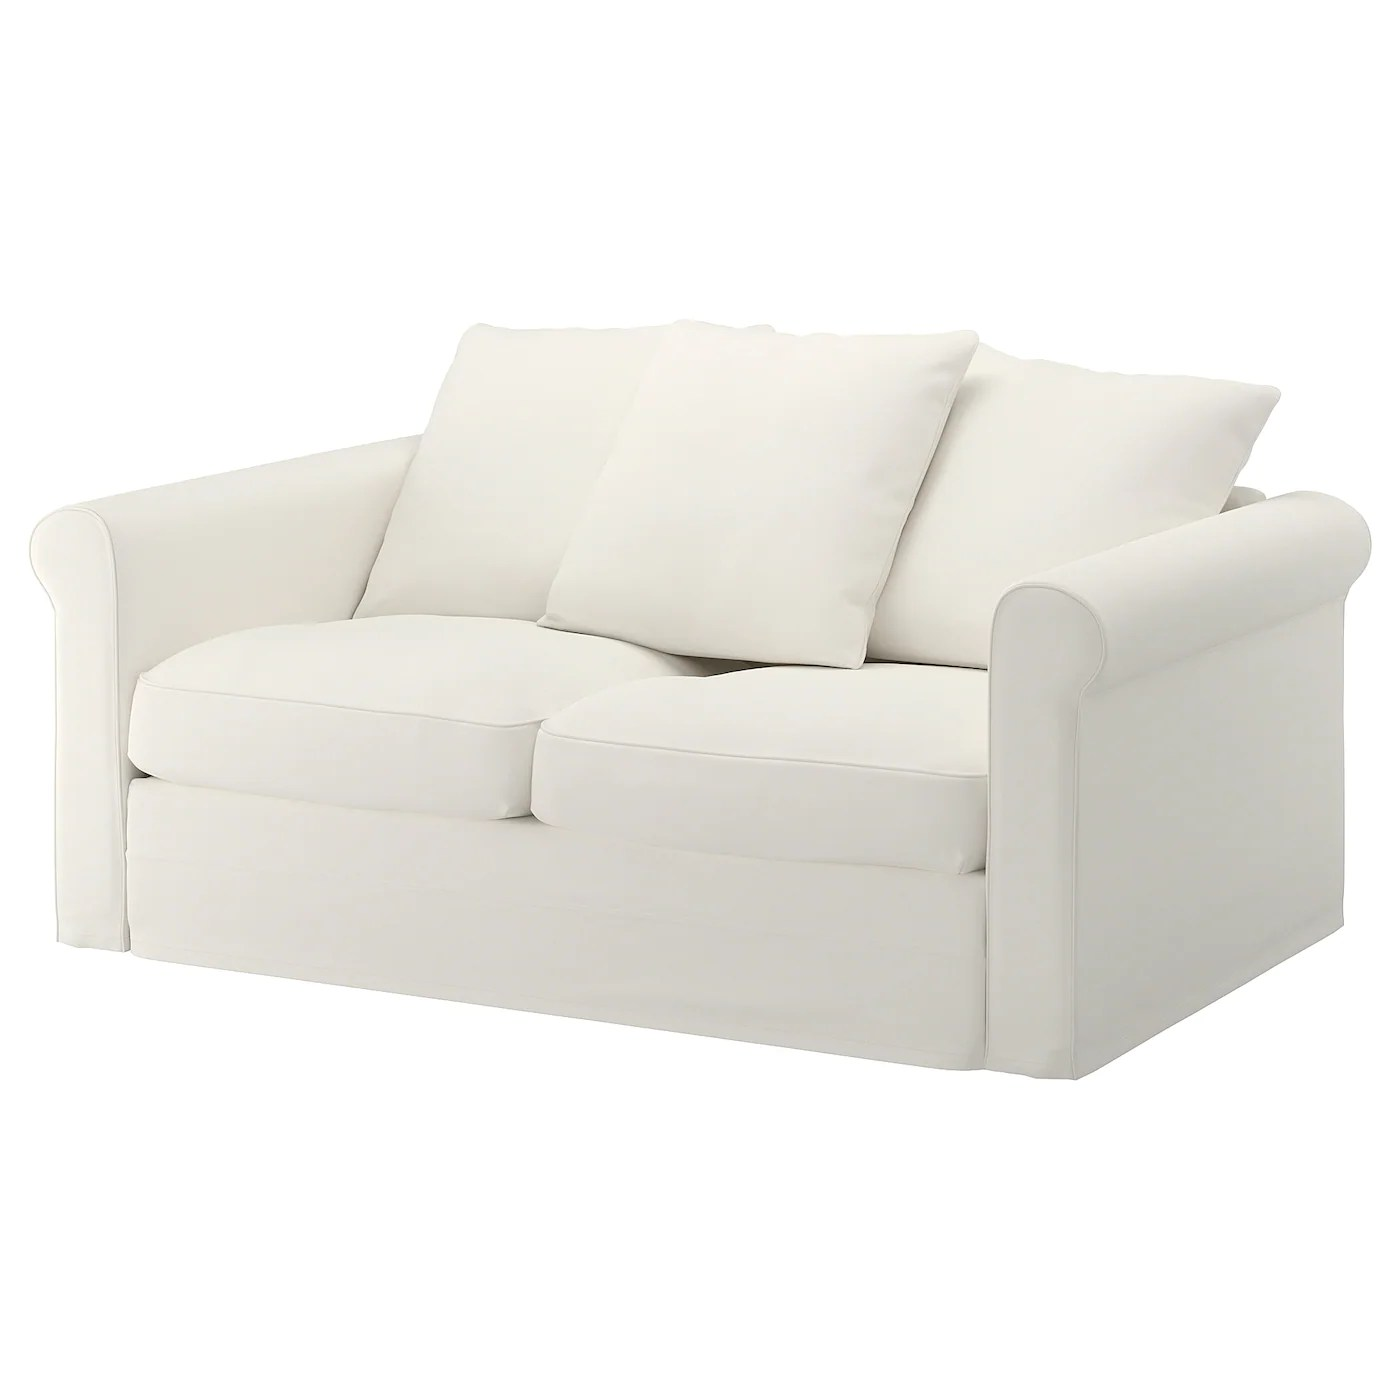 guineys dining chair covers foam bean bag sofa ikea ireland dublin gronlid cover for 2 seat